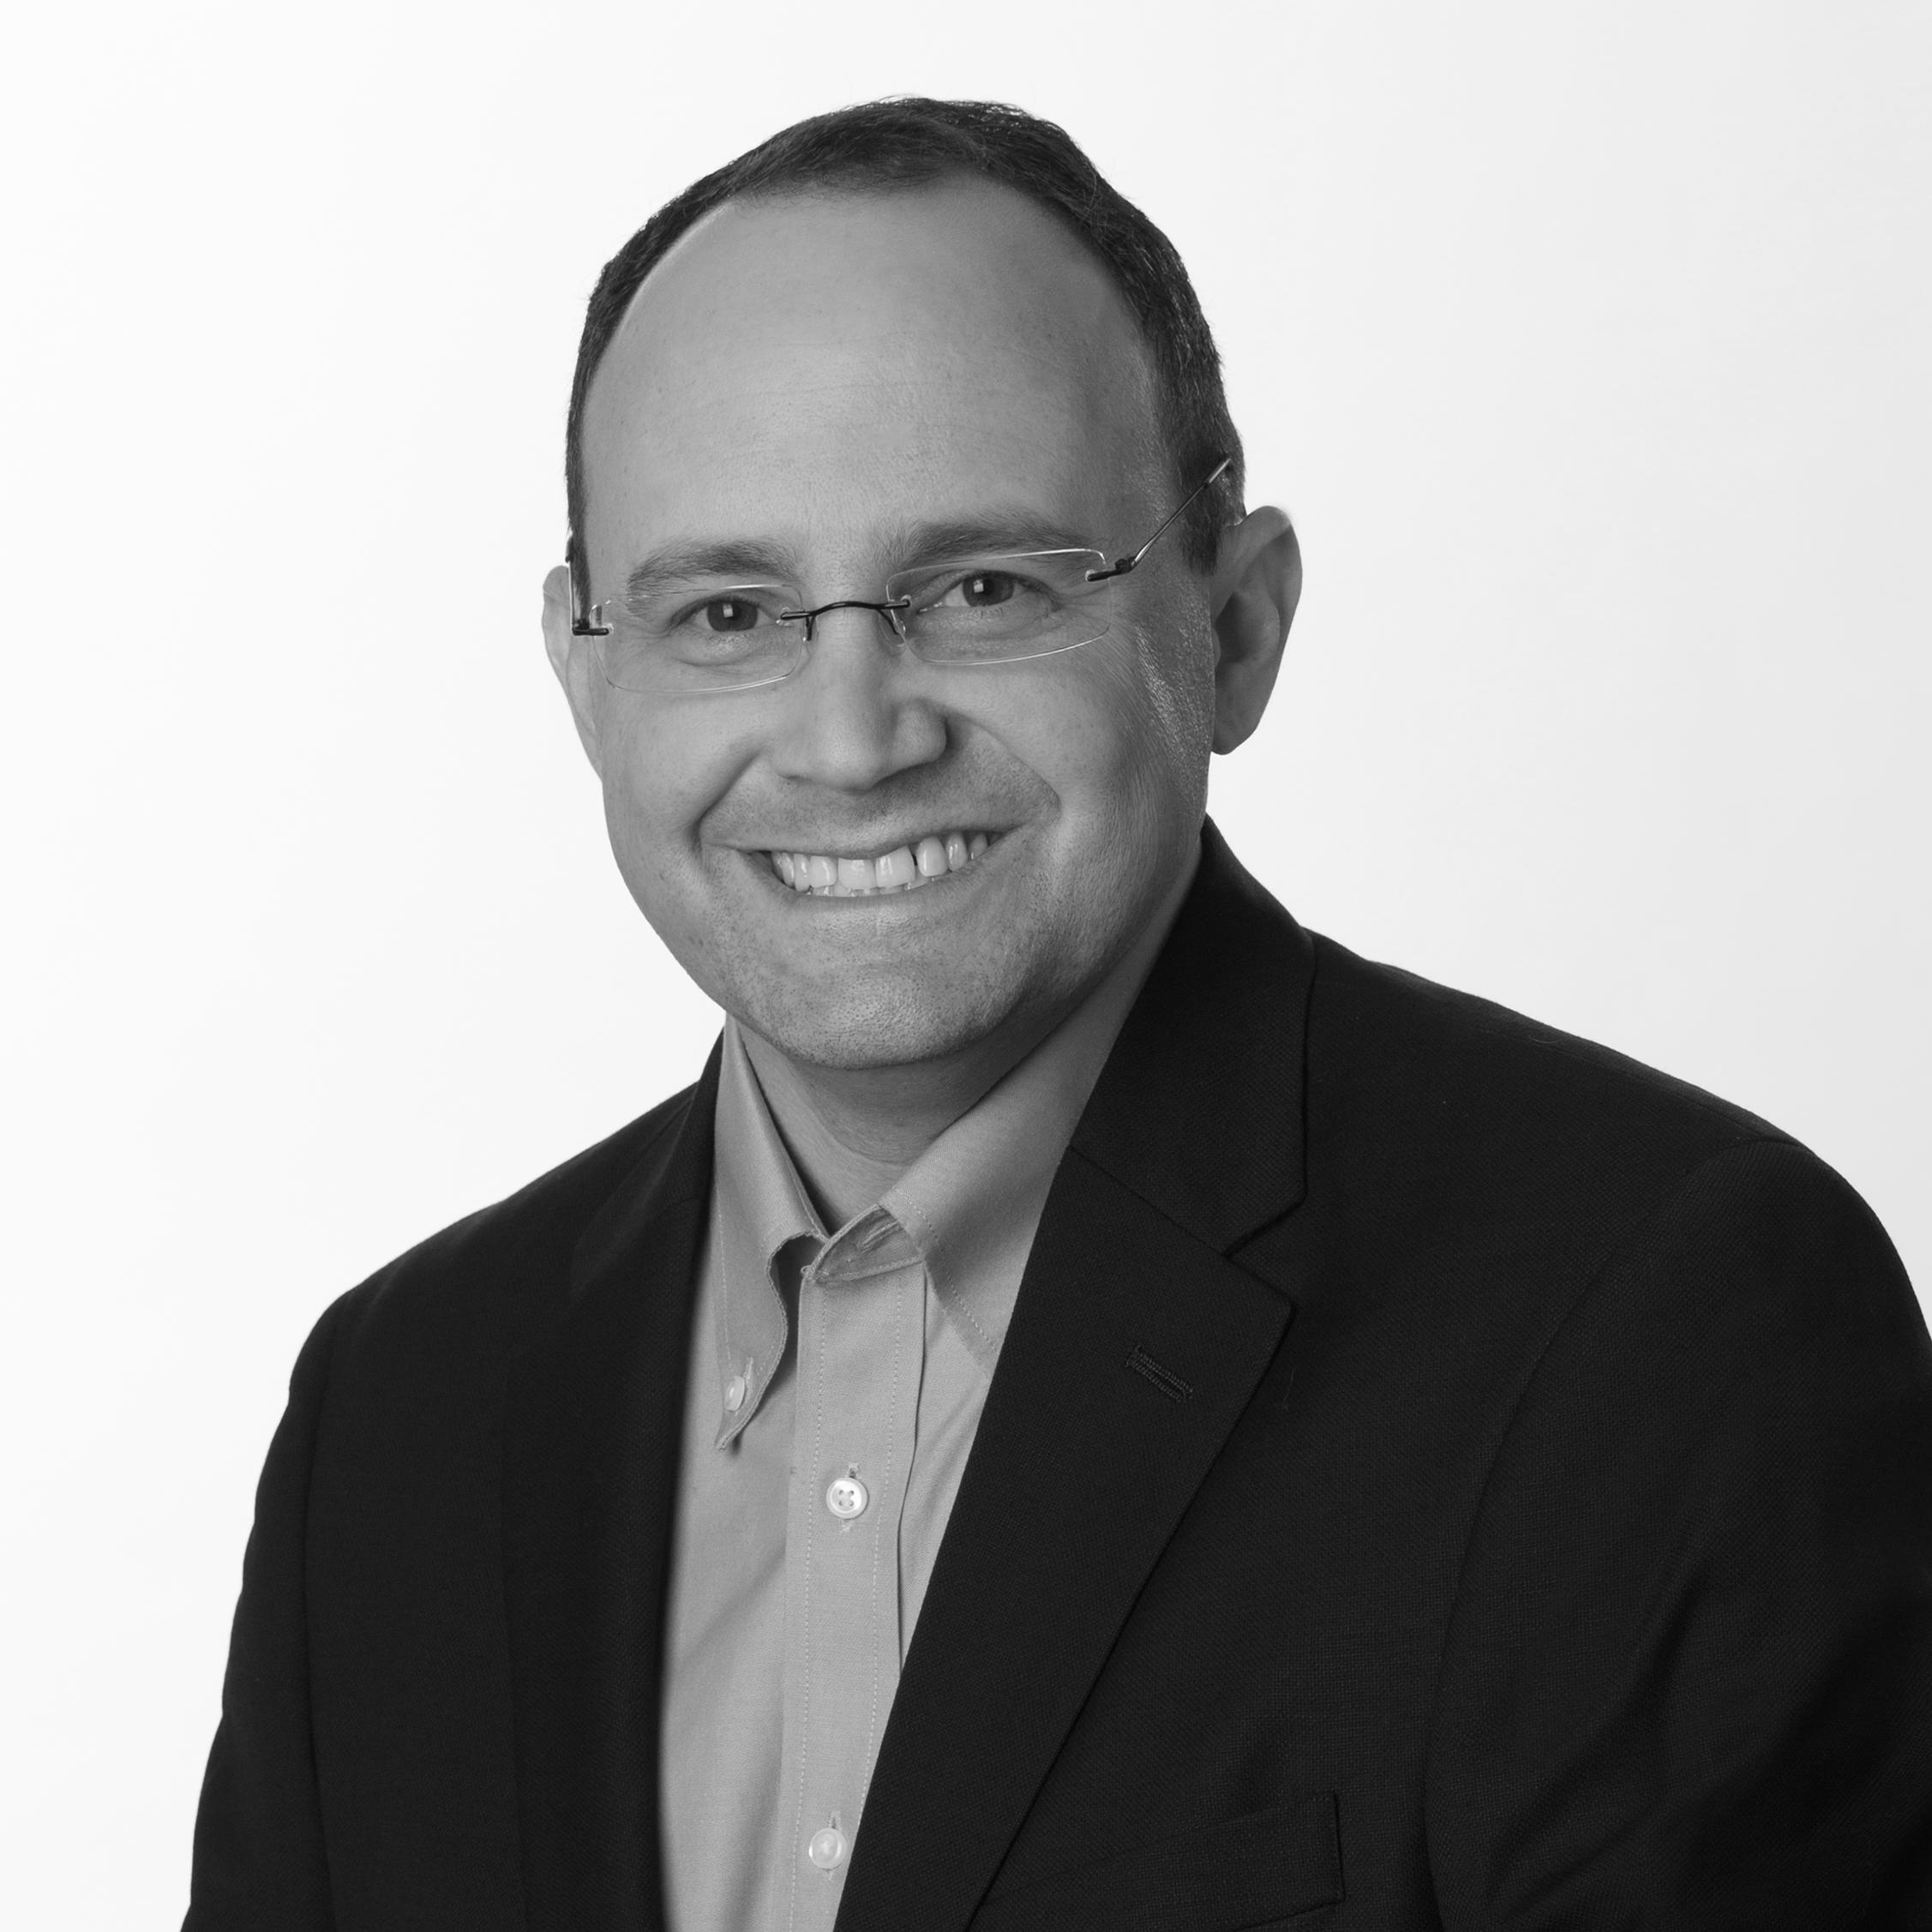 Steve Grobman